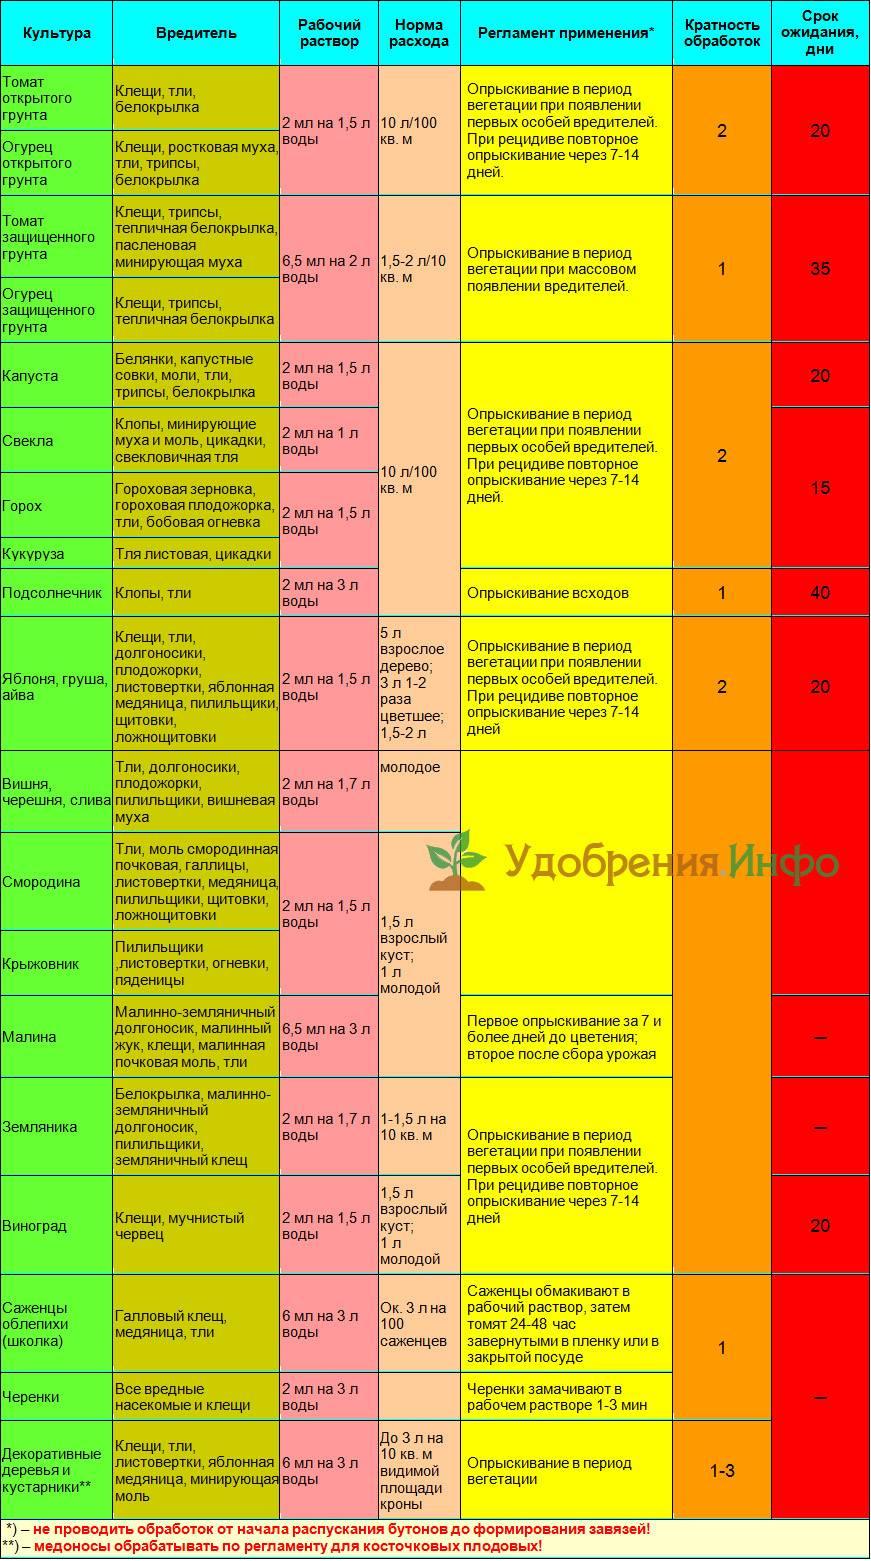 Фуфанон инсектицид инструкция по применению